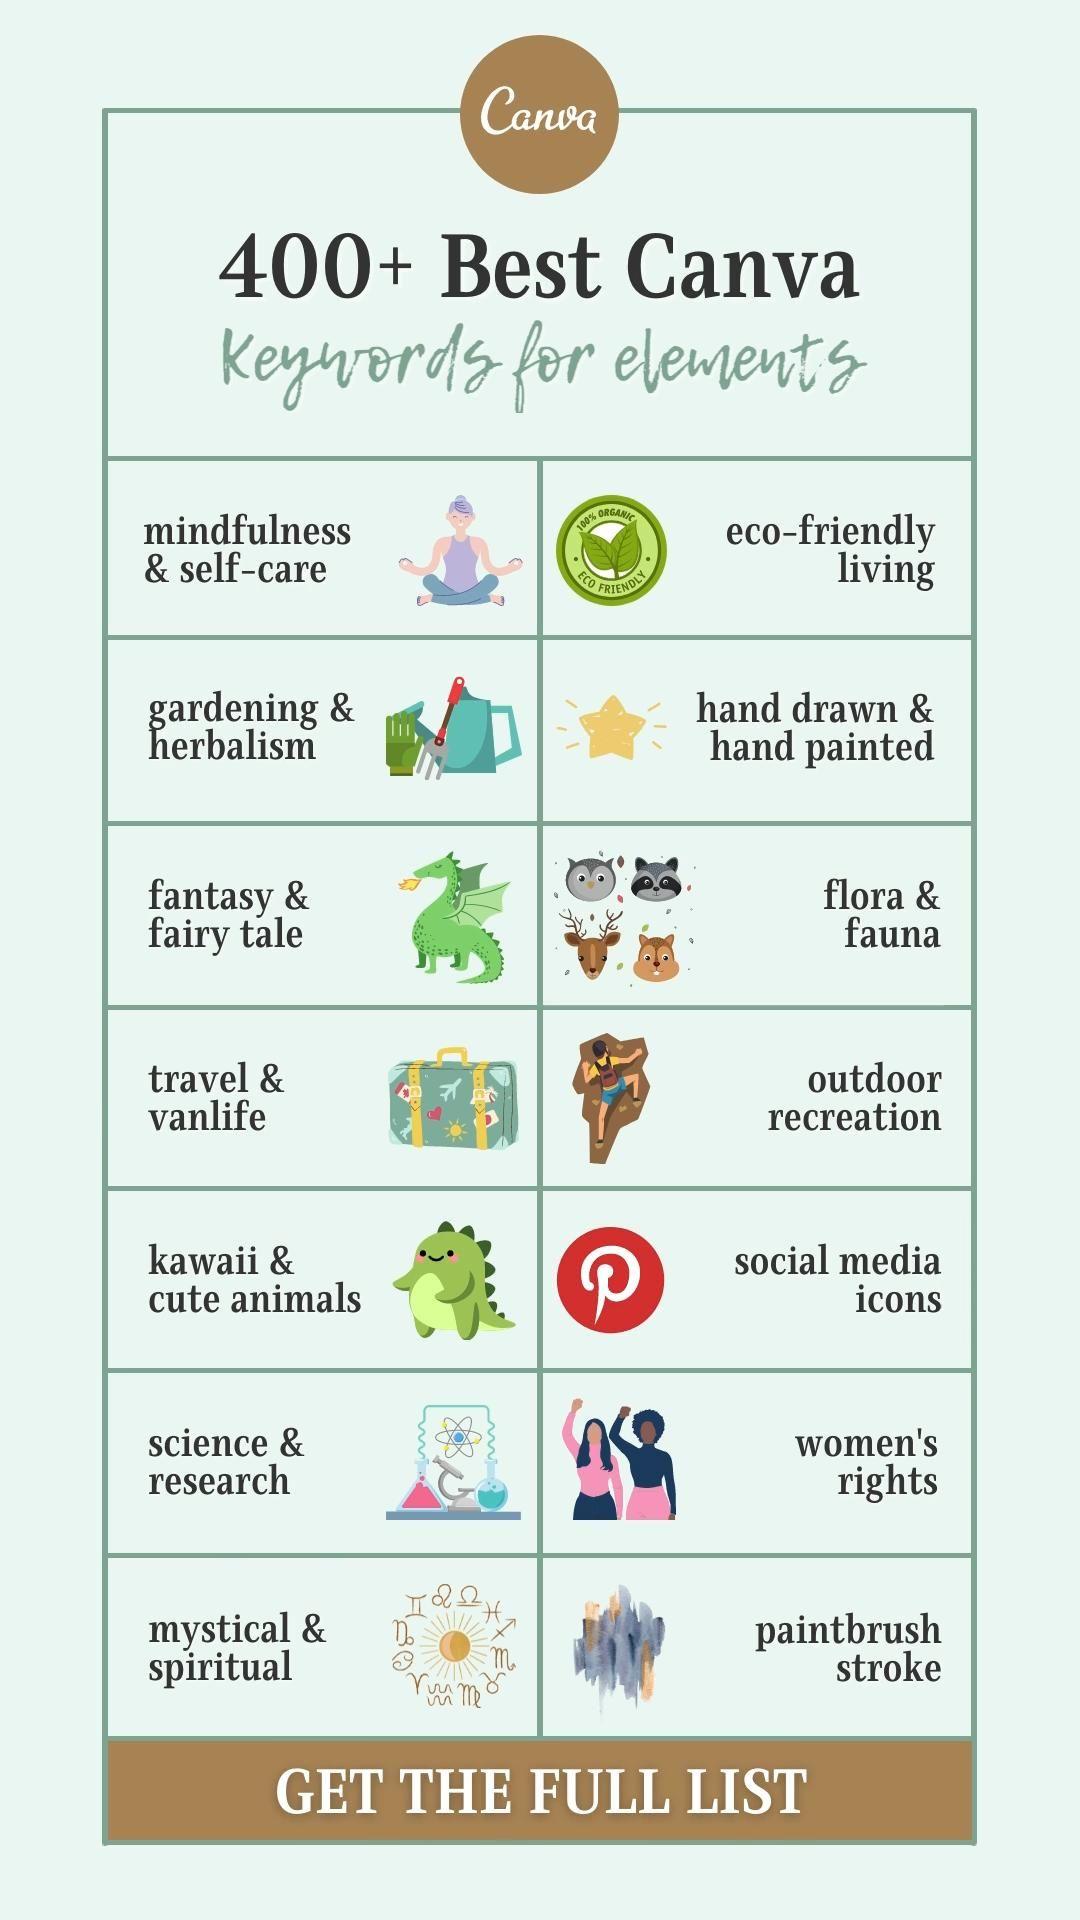 400+ Best Canva Keywords Elements List for Aesthetic Illustrations